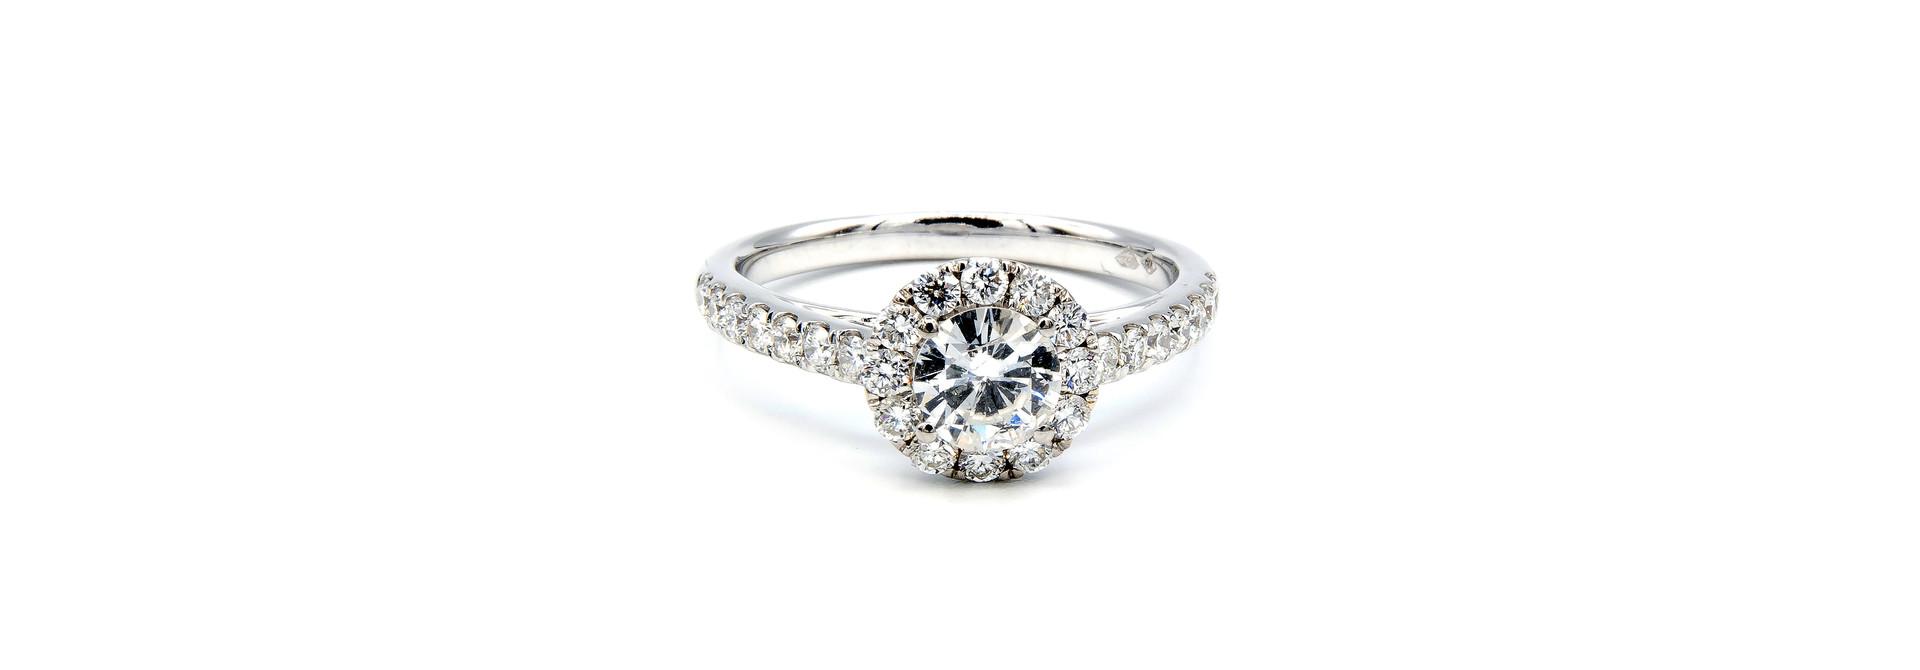 Ring verlovingsring witgoud met 0,5 ct SI en 0,59 ct VS diamant